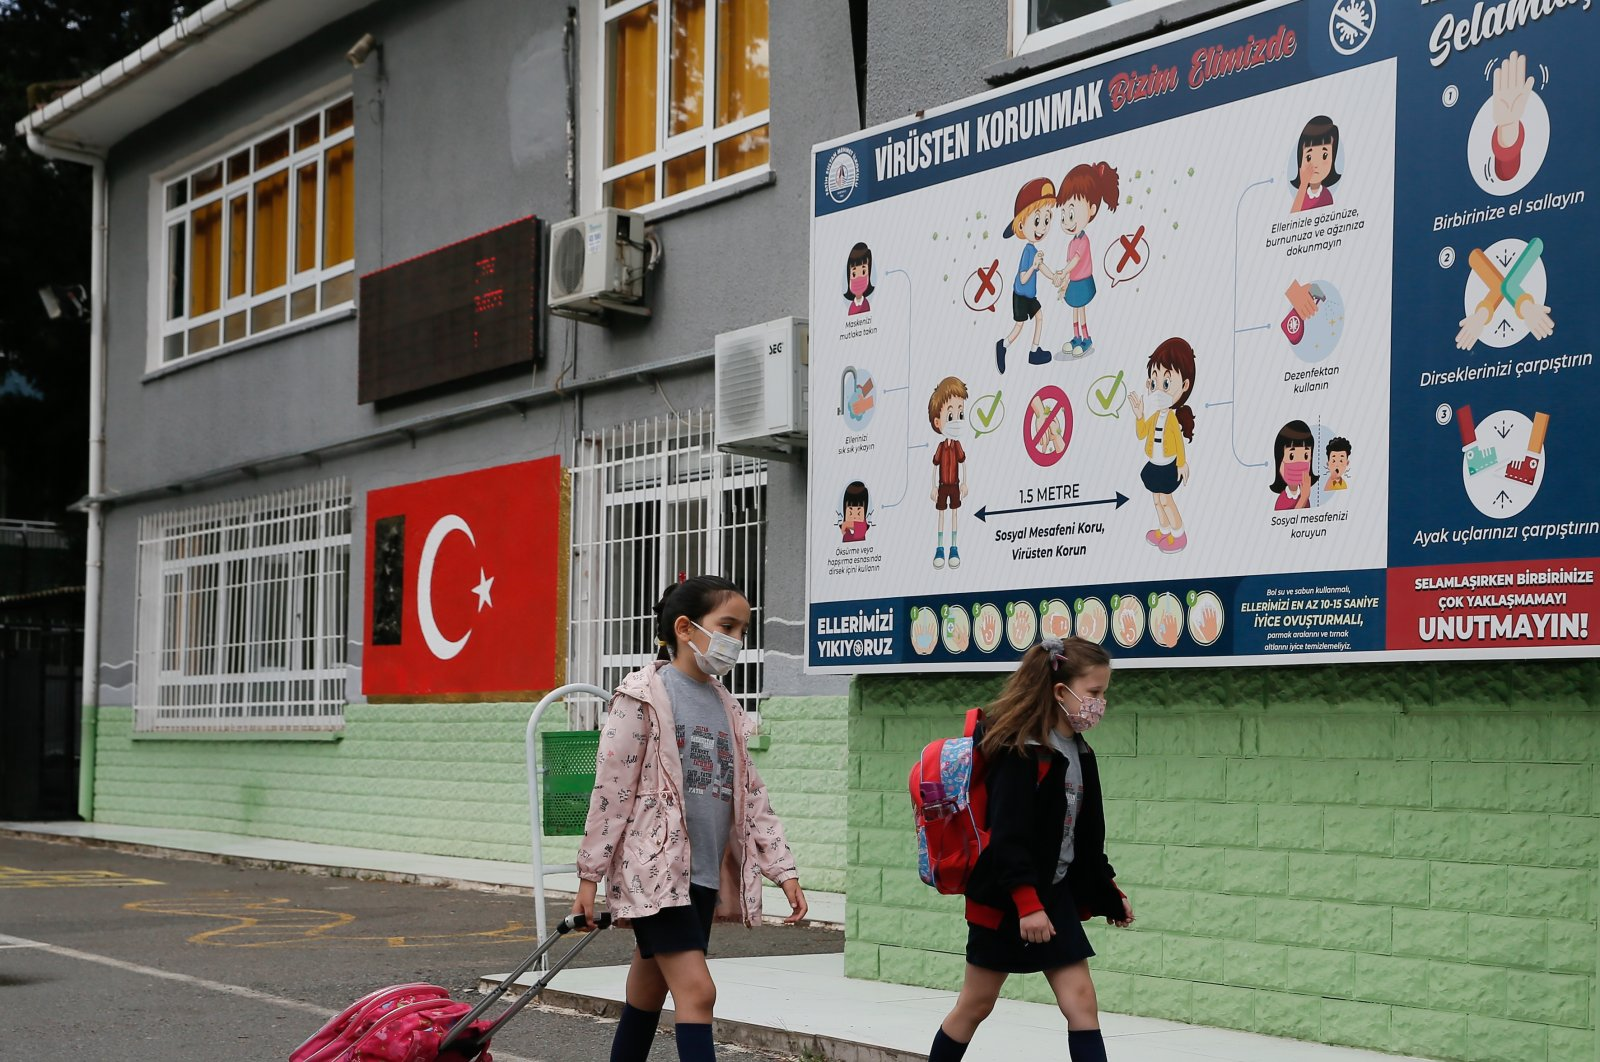 Children walk past a billboard about COVID-19 en route to school, in Izmir, western Turkey, June 1, 2021. (AA PHOTO)